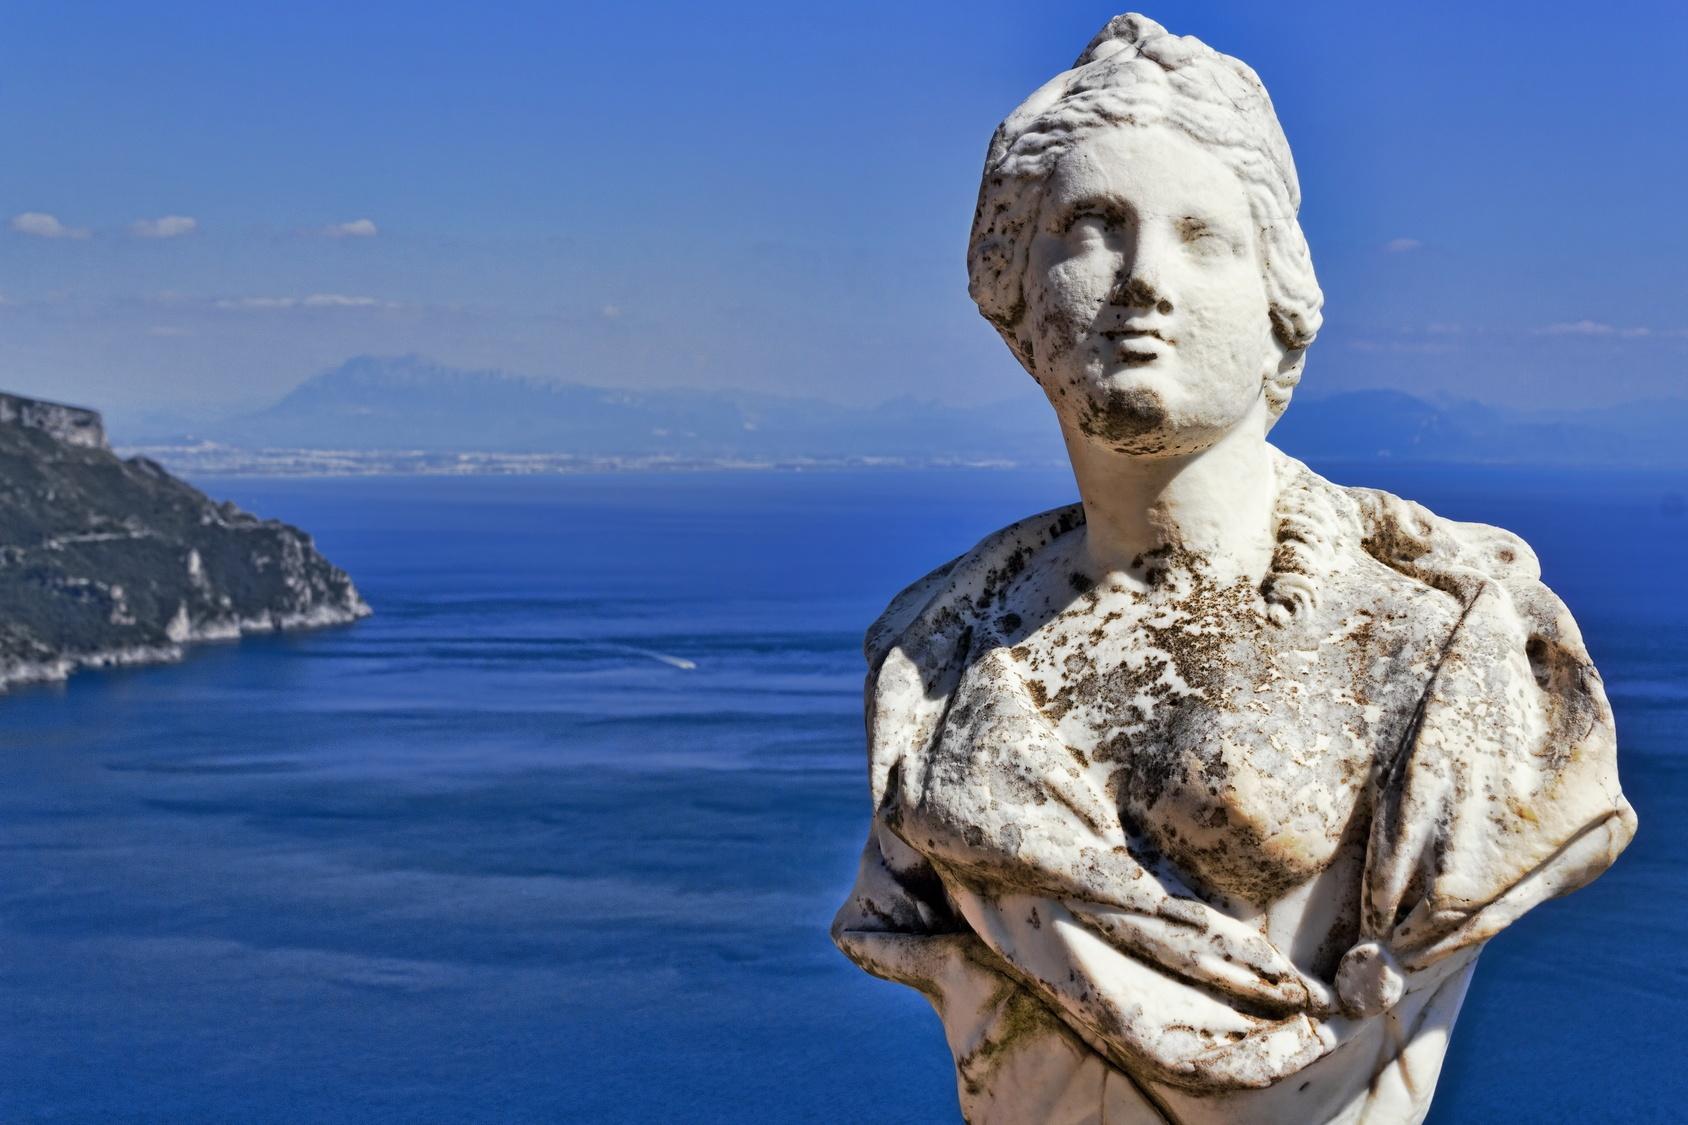 Amalfi_Capri_Tourissimo_8.jpg